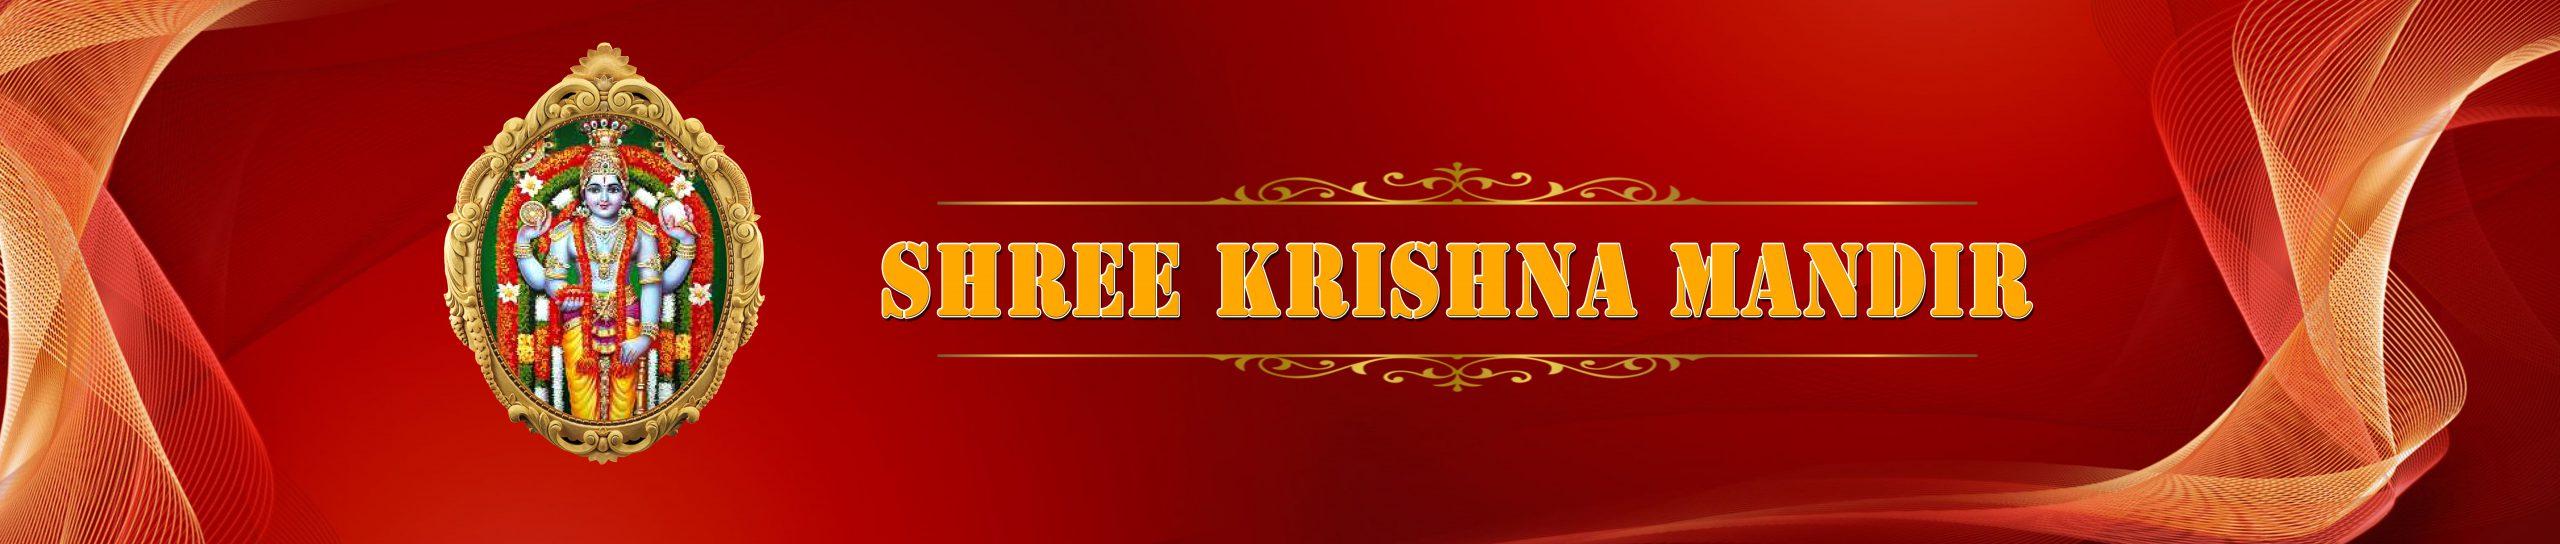 Shree Krishna Mandir